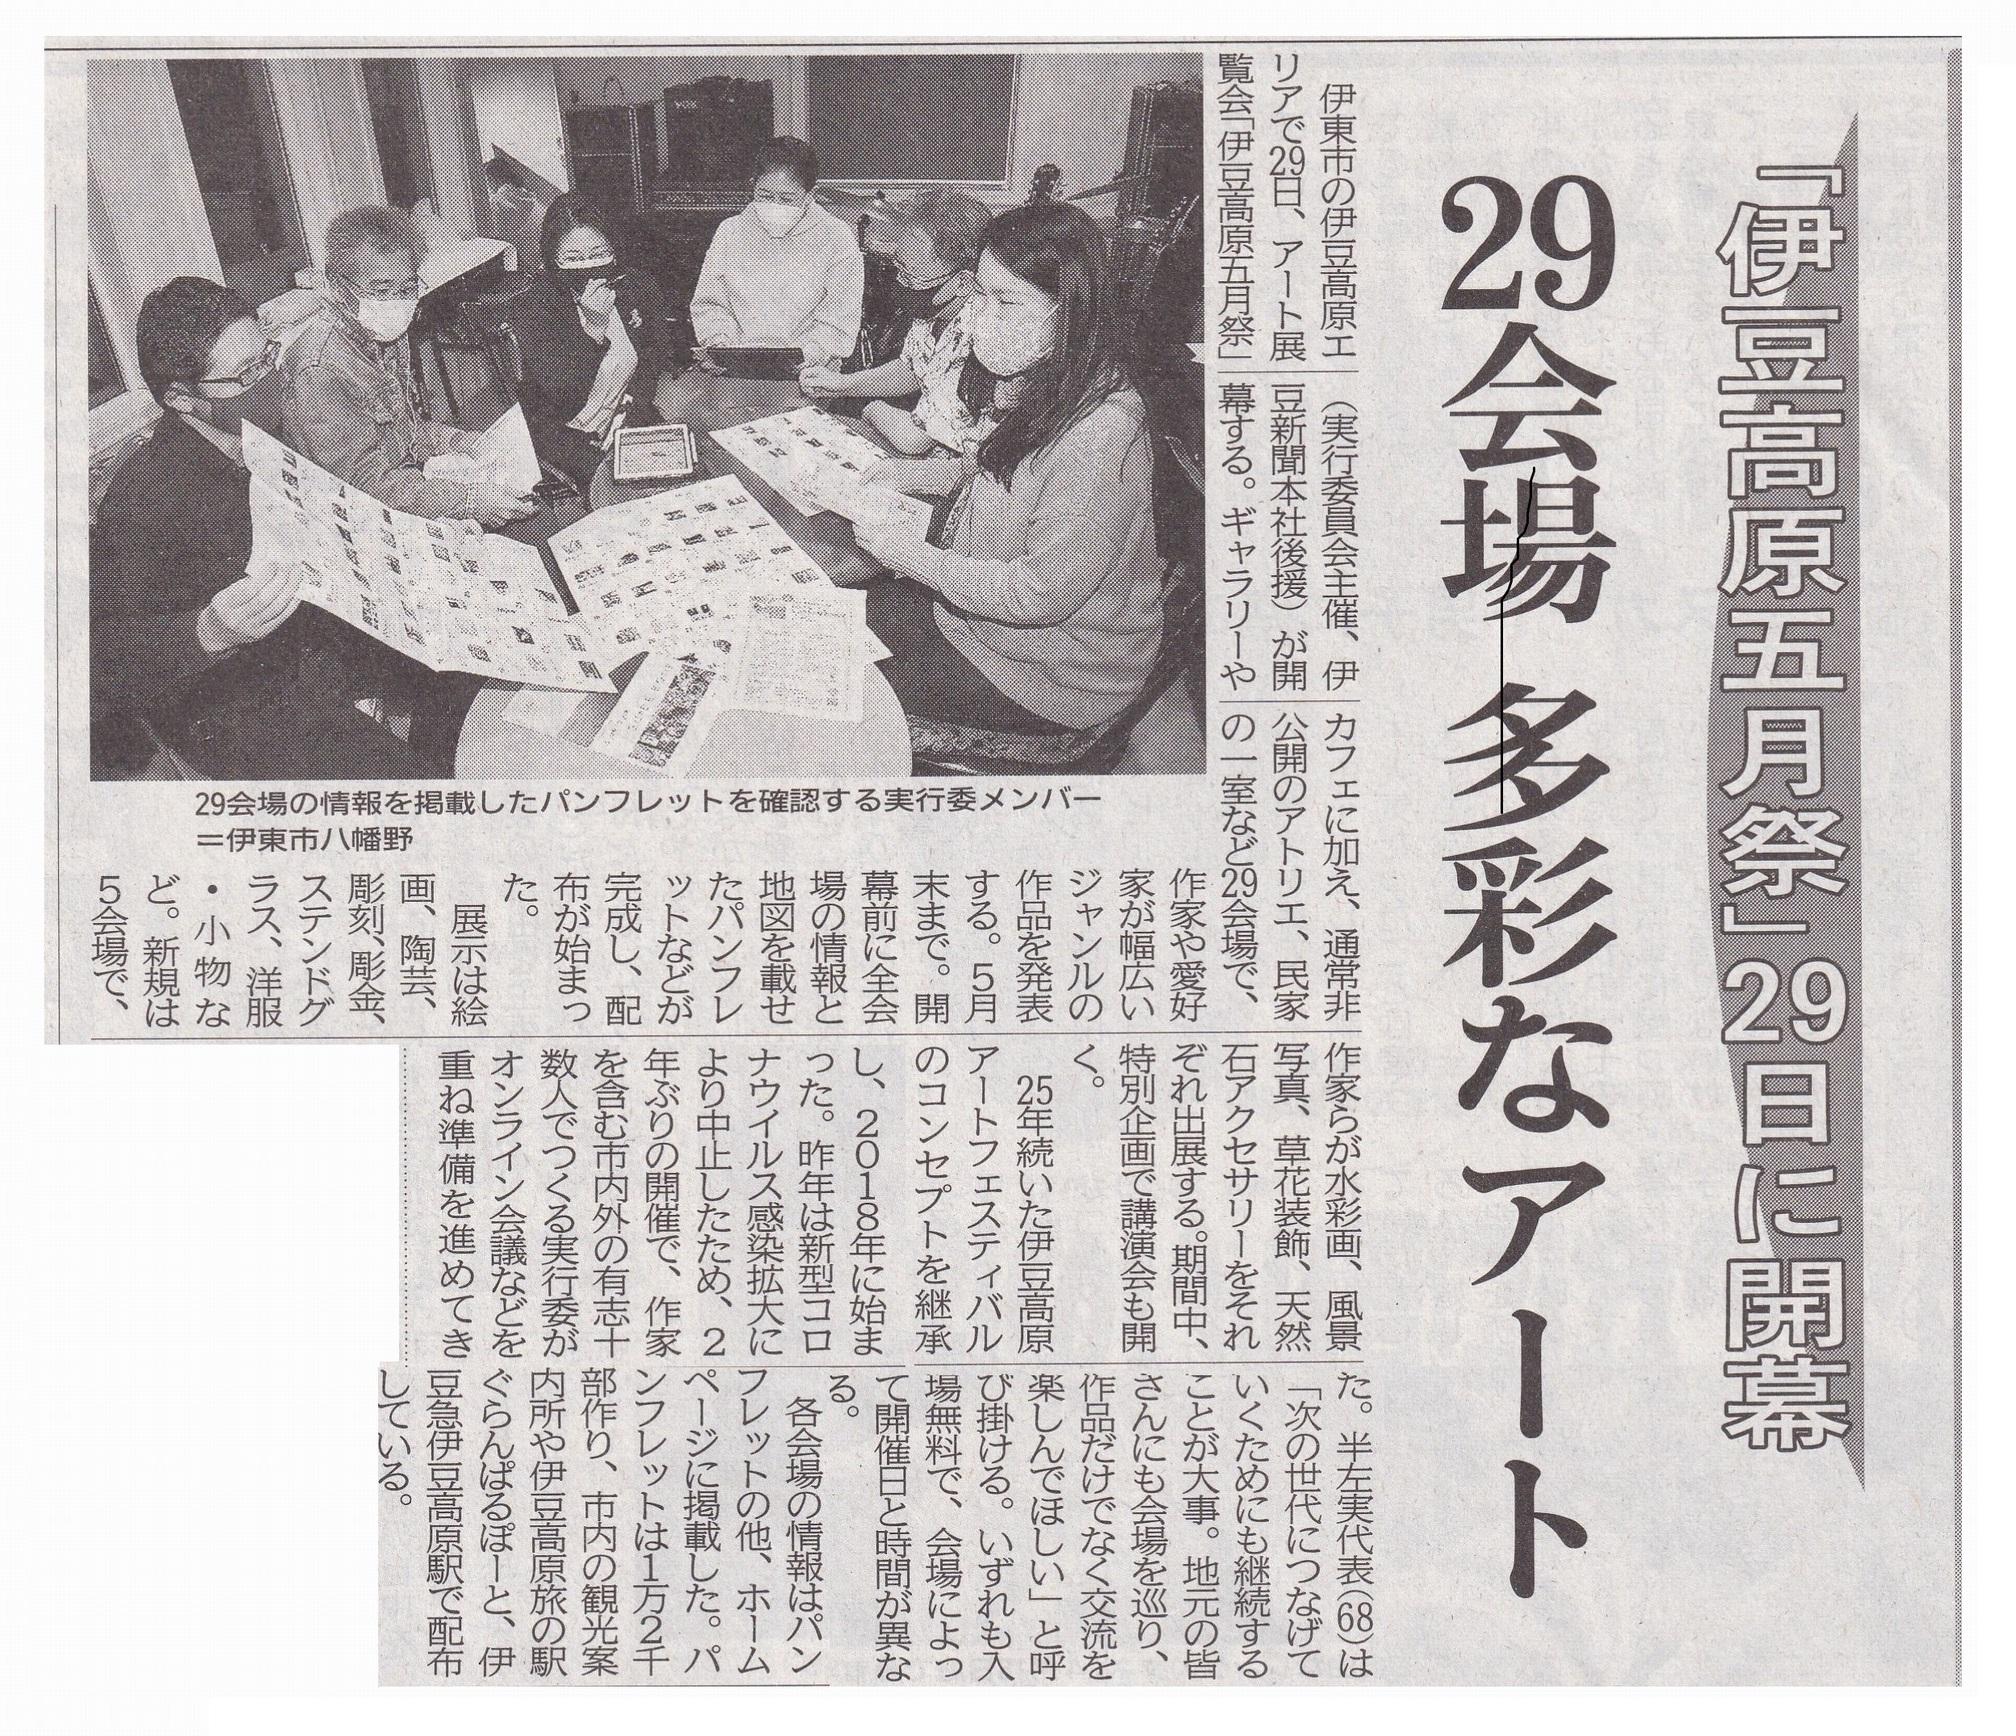 https://www.magaret.jp/mt_img/5%E6%9C%88%E7%A5%AD%E6%96%B0%E8%81%9E%E8%A8%98%E4%BA%8B_JALAN_210421.jpg